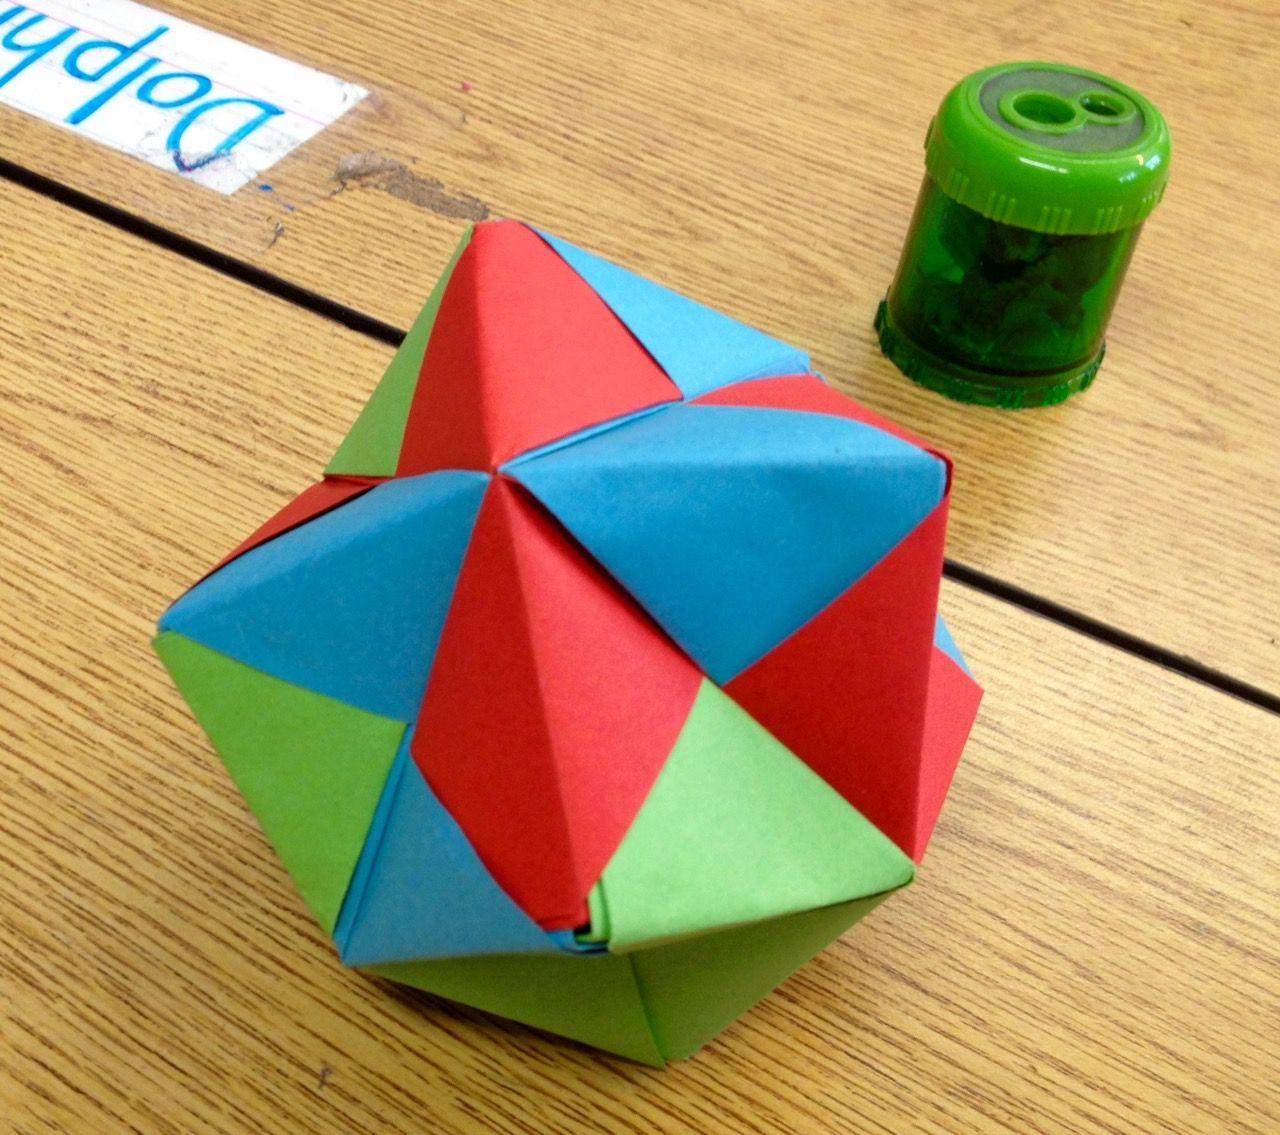 Teaching Math With Modular Origami Scholastic Com Origami And Math Origami Geometric Shapes Geometric Origami